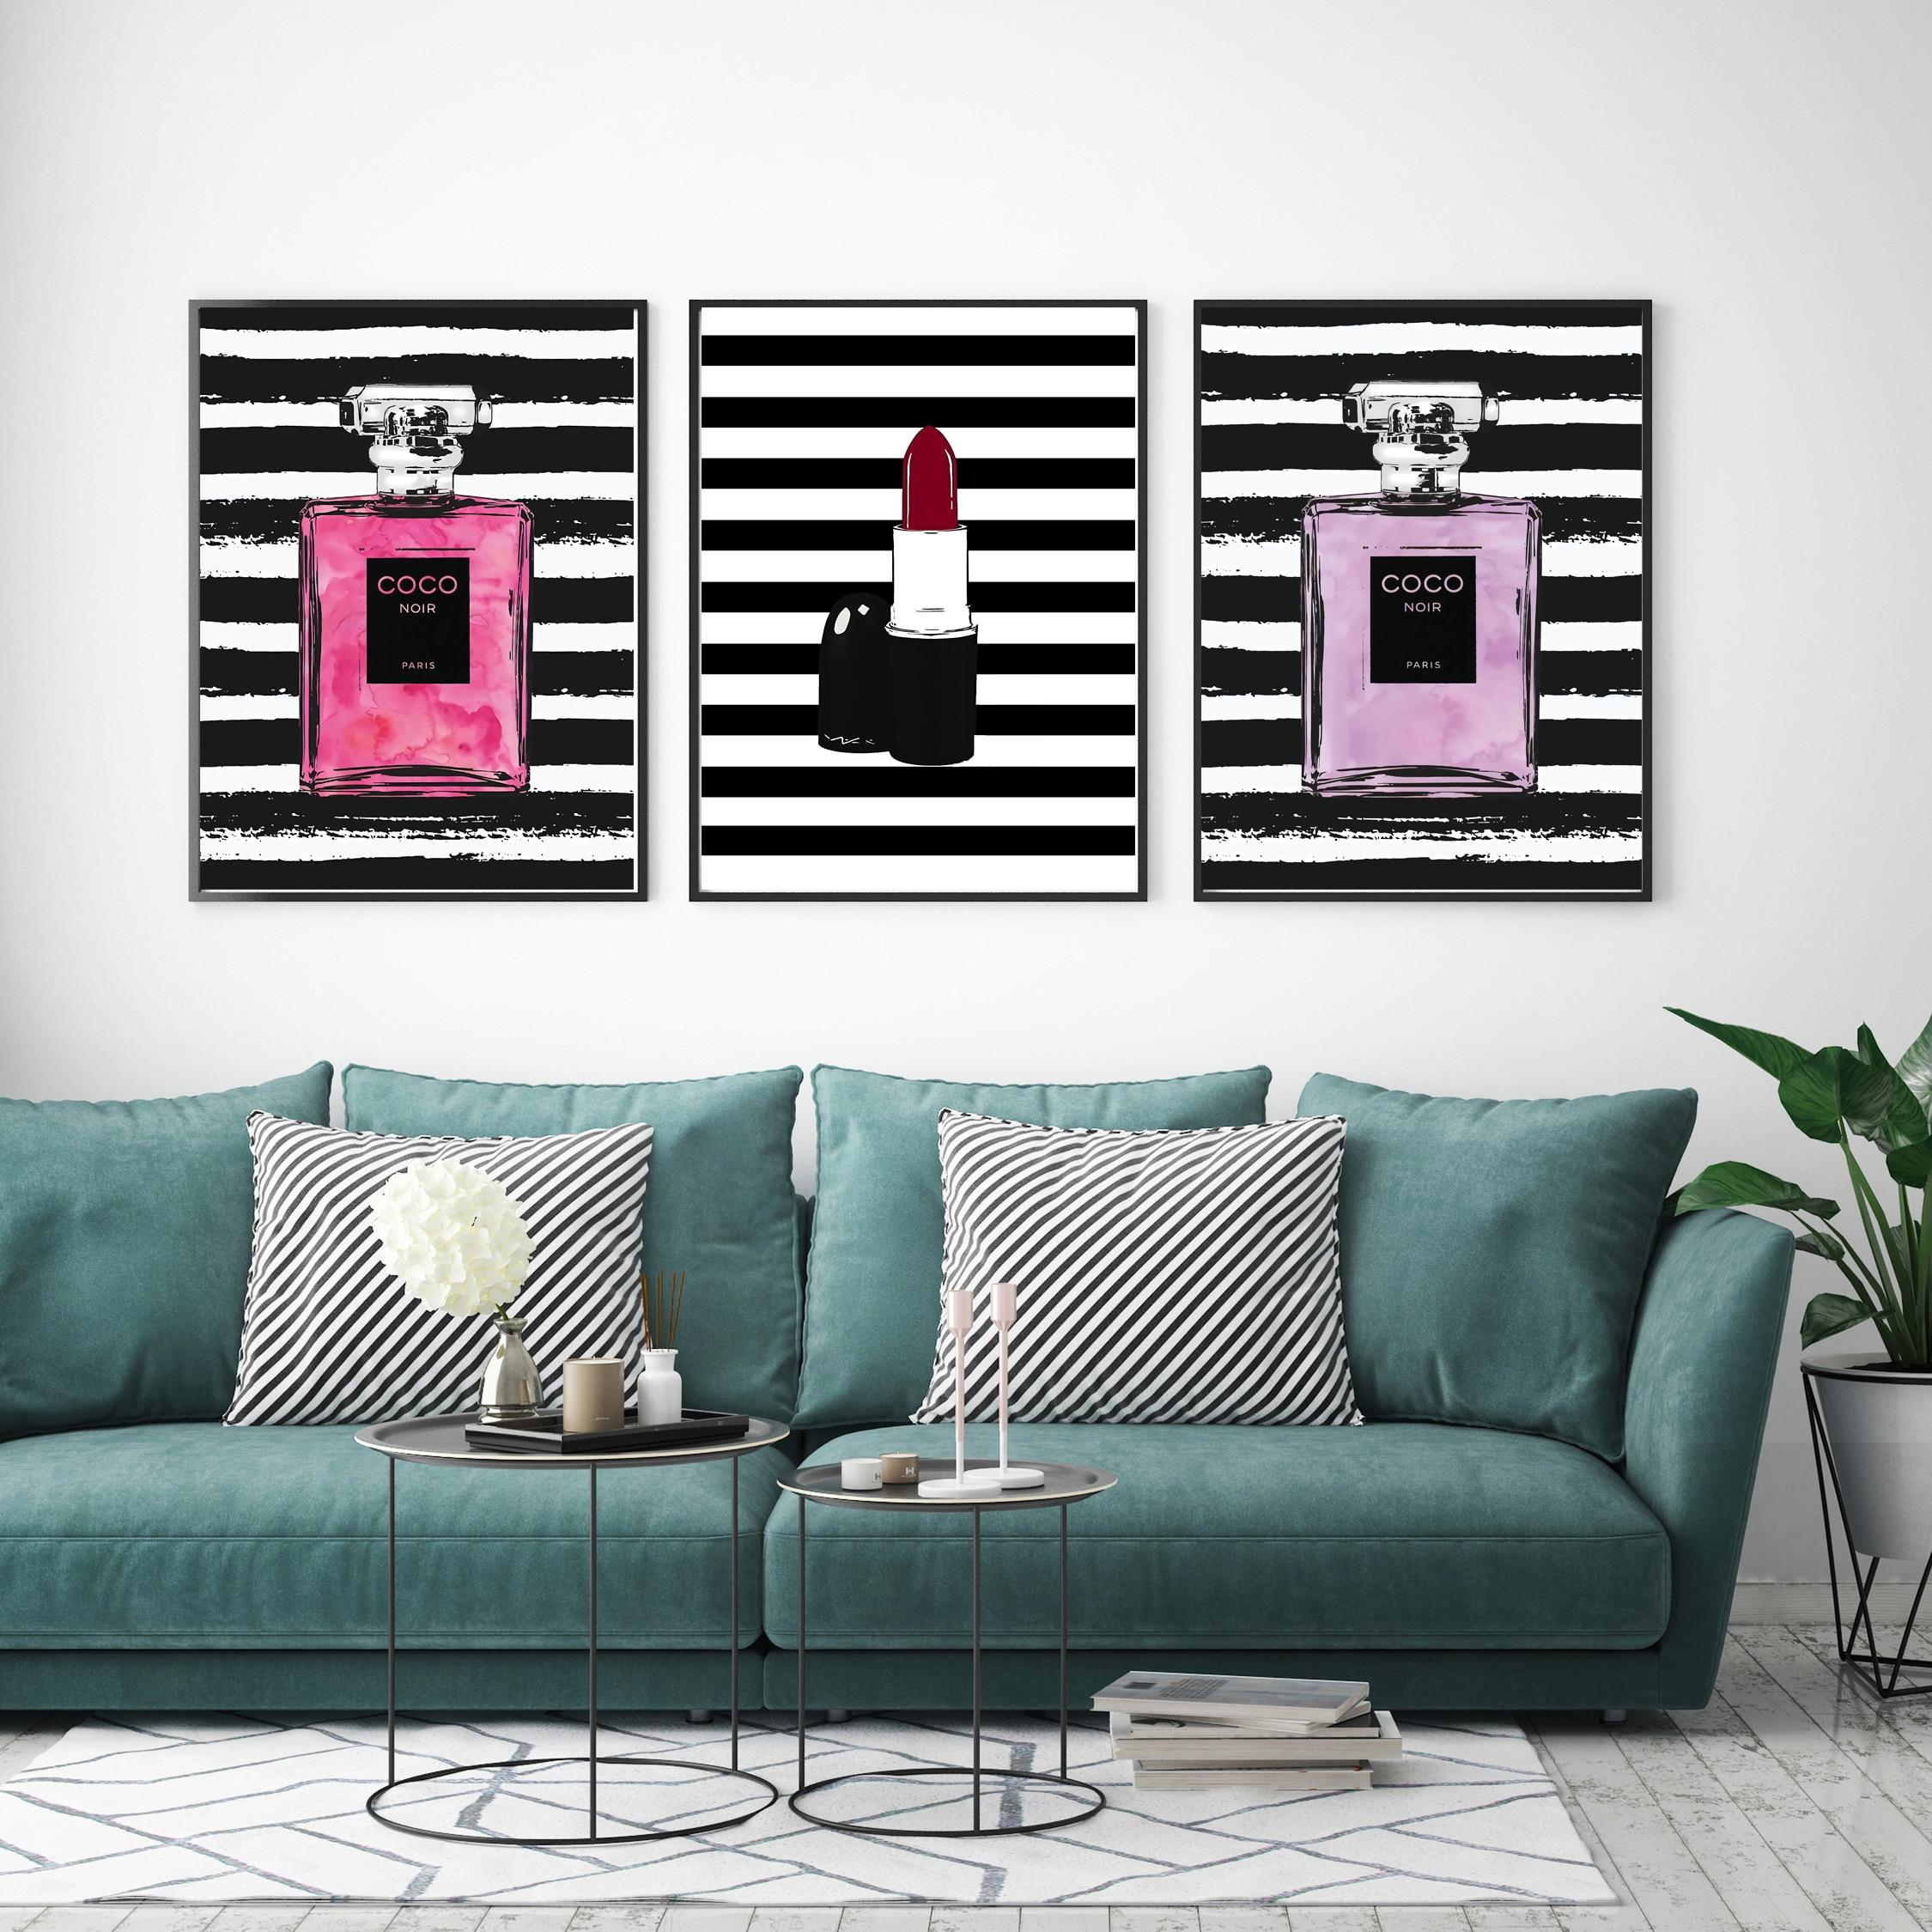 Nórdico abstracto lápiz labial COCO botella de Perfume cuadro sobre lienzo para pared moderna de pared para sala de decoración para el hogar, sin marco